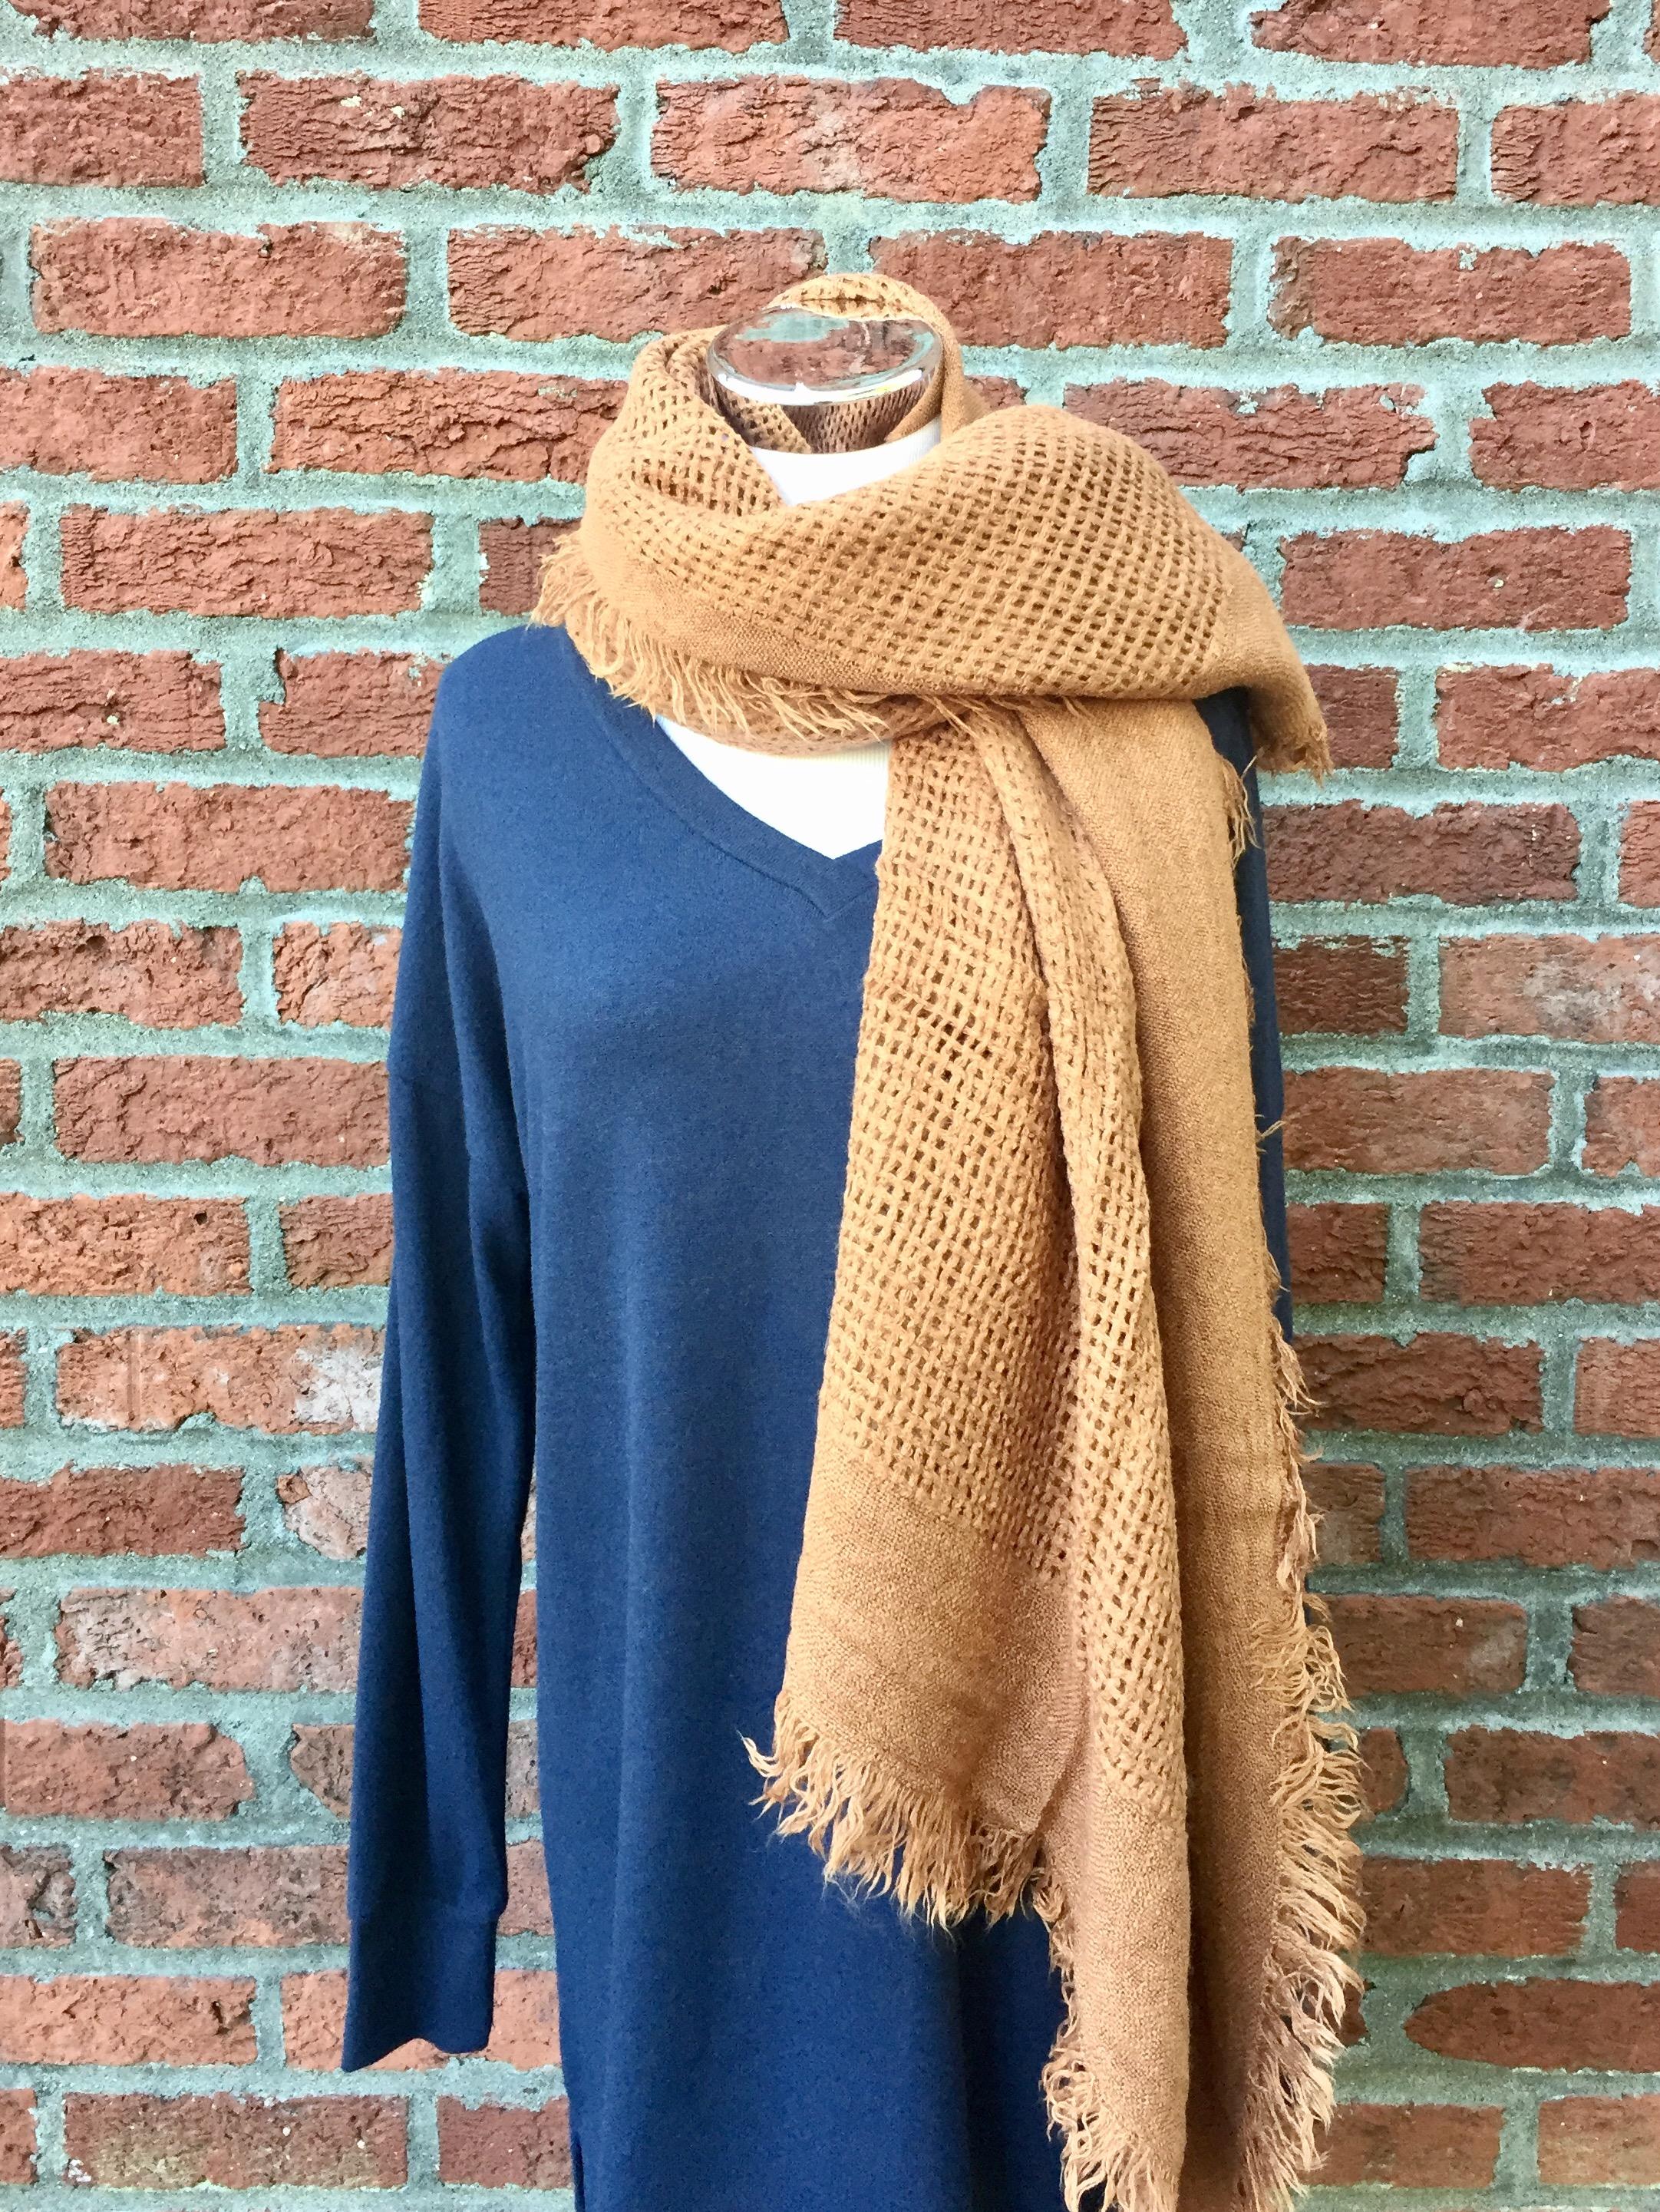 Reb + J Sweater ($32) with Orange Scarf ($21)